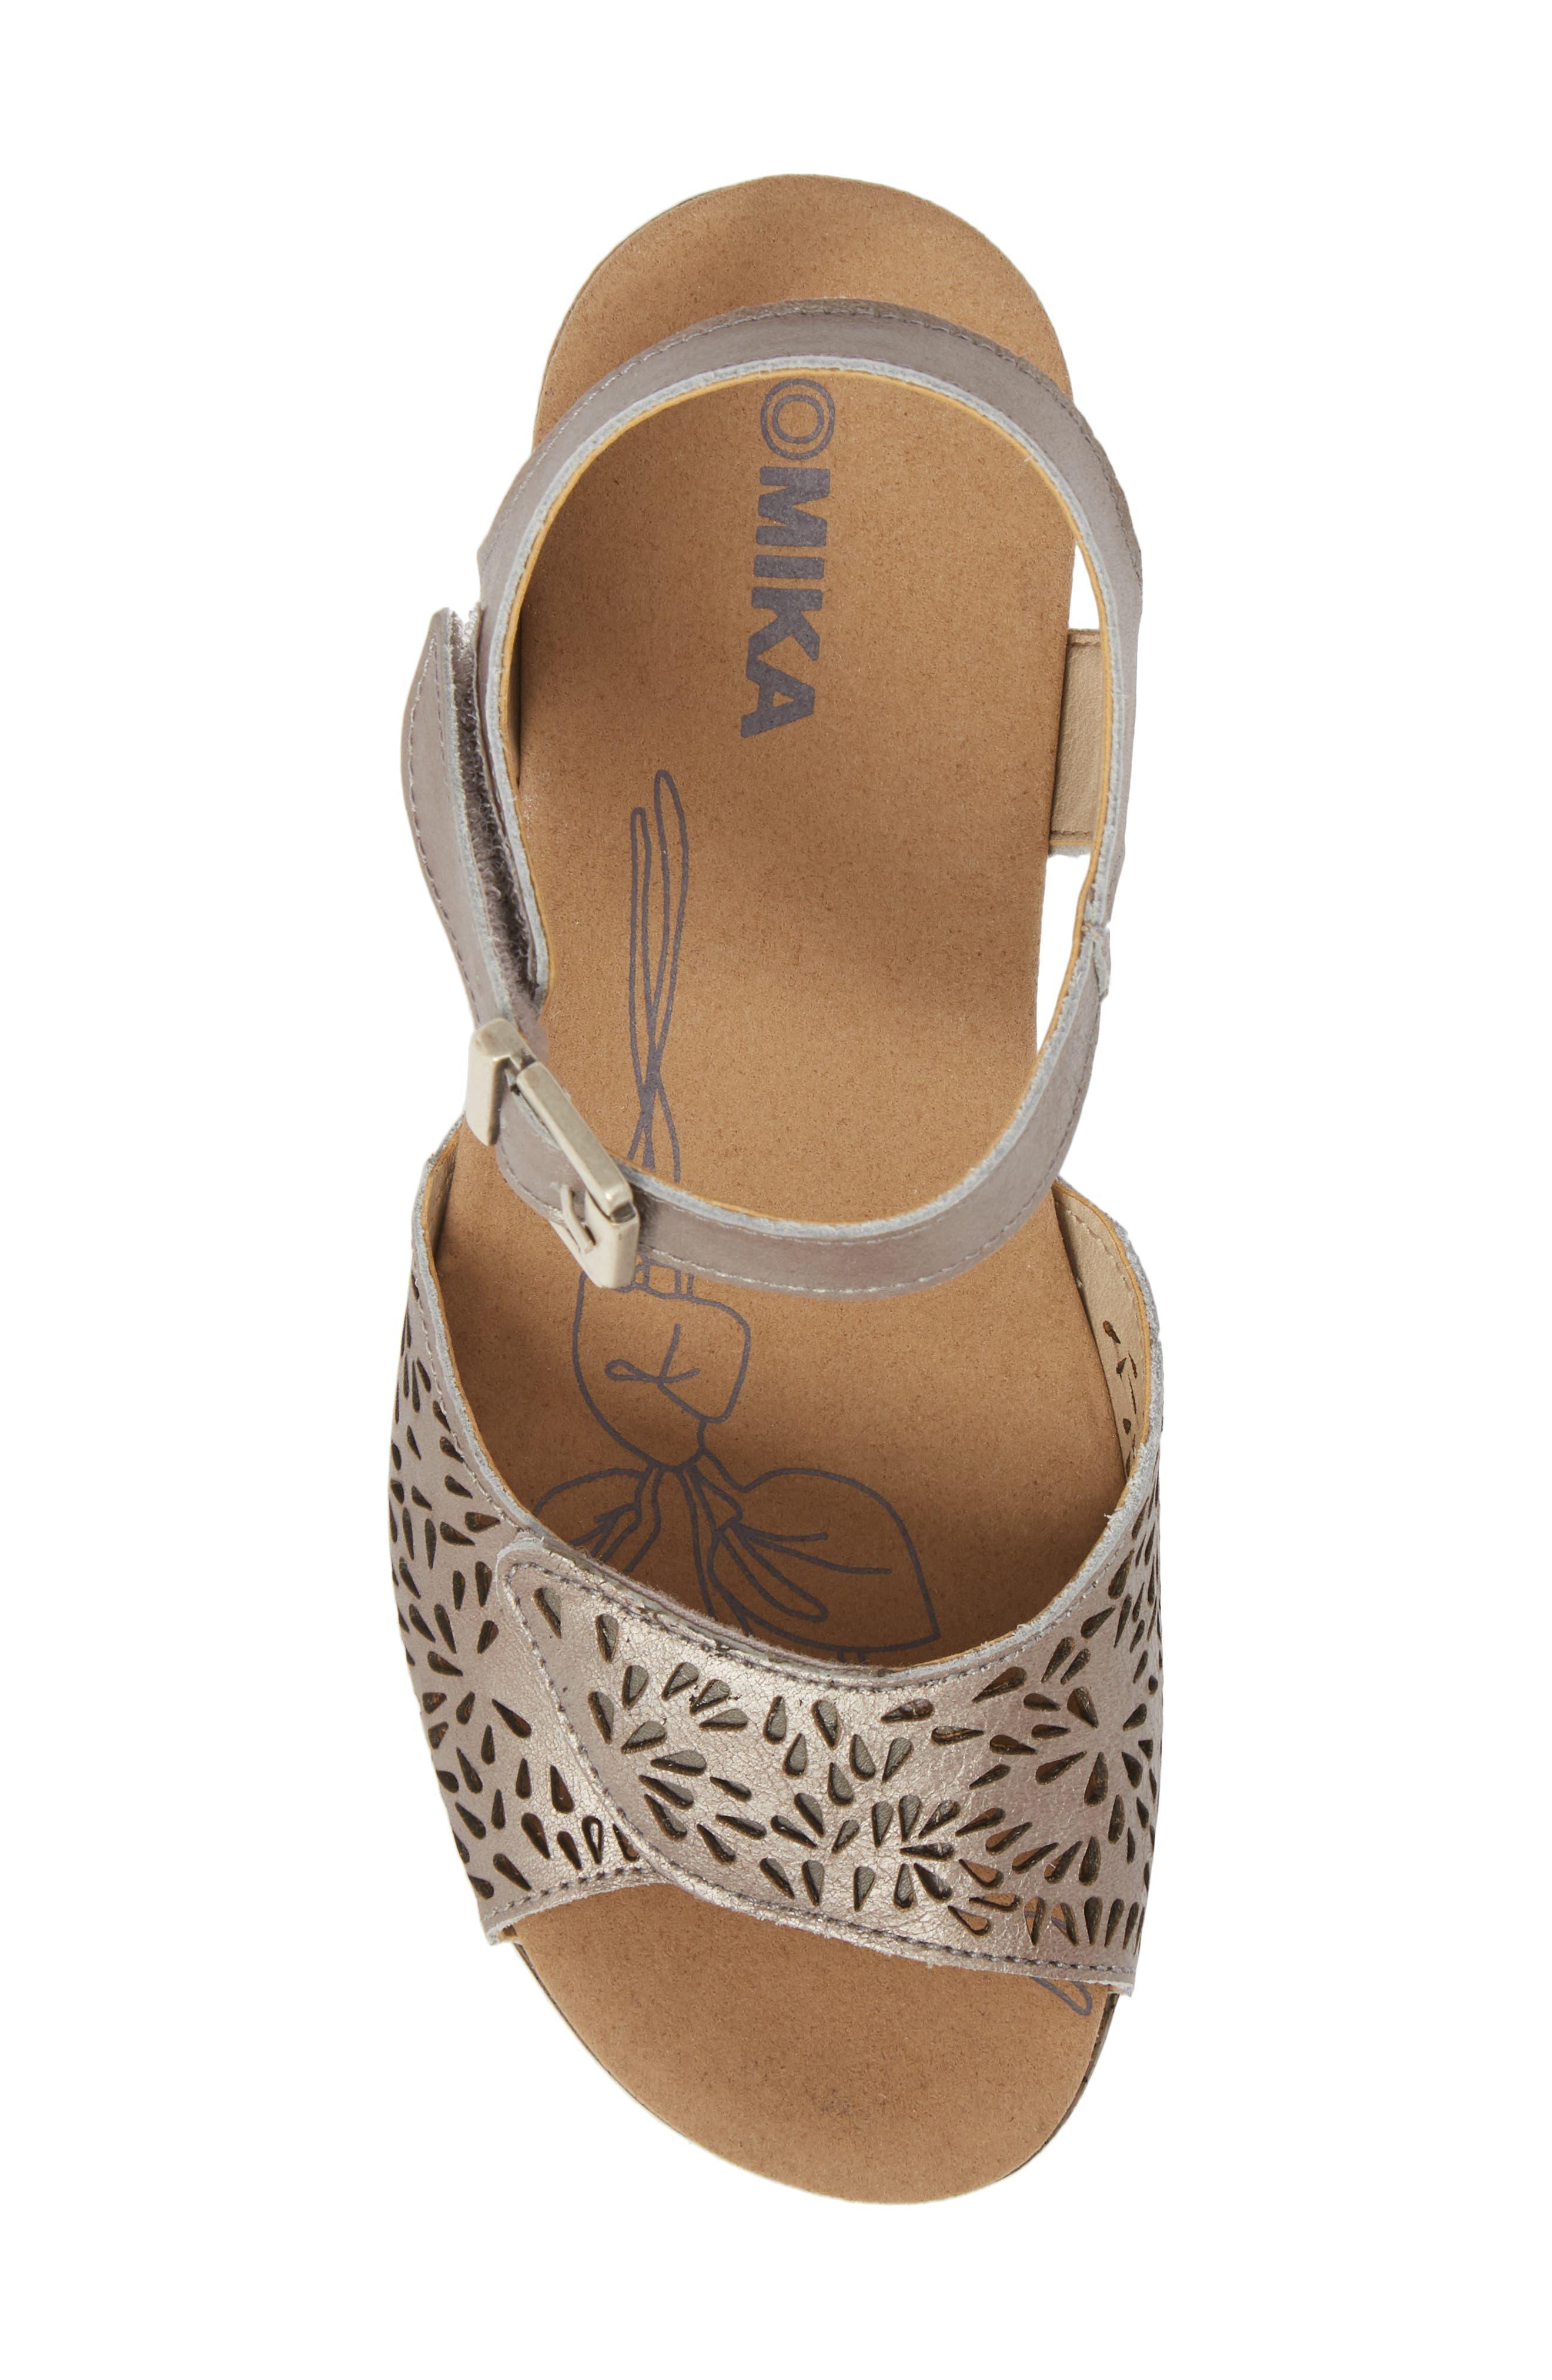 Nevis 05 Sandal,                             Alternate thumbnail 5, color,                             Platinum Leather